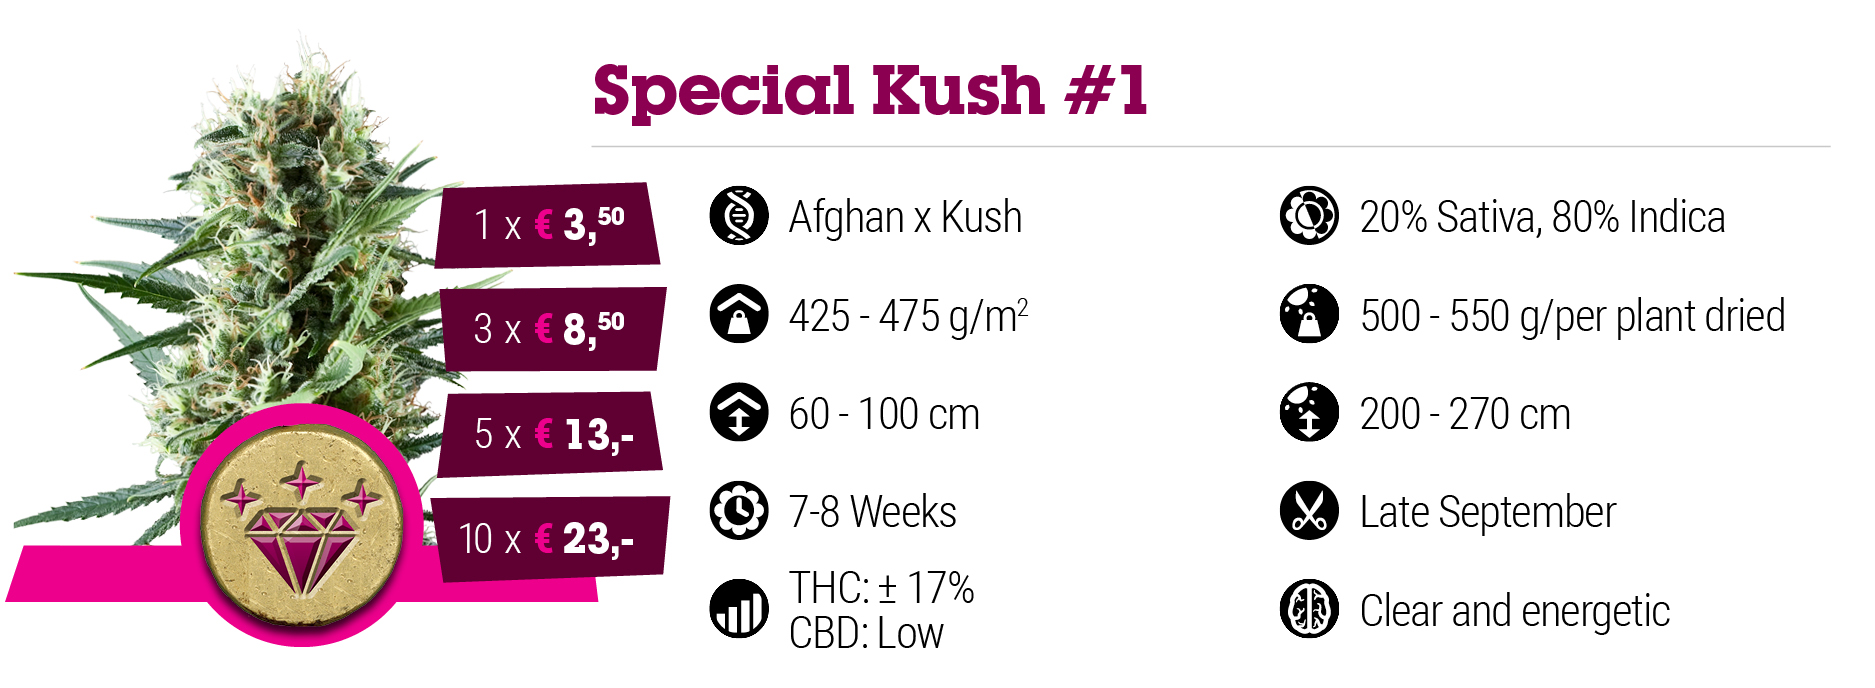 Special Kush